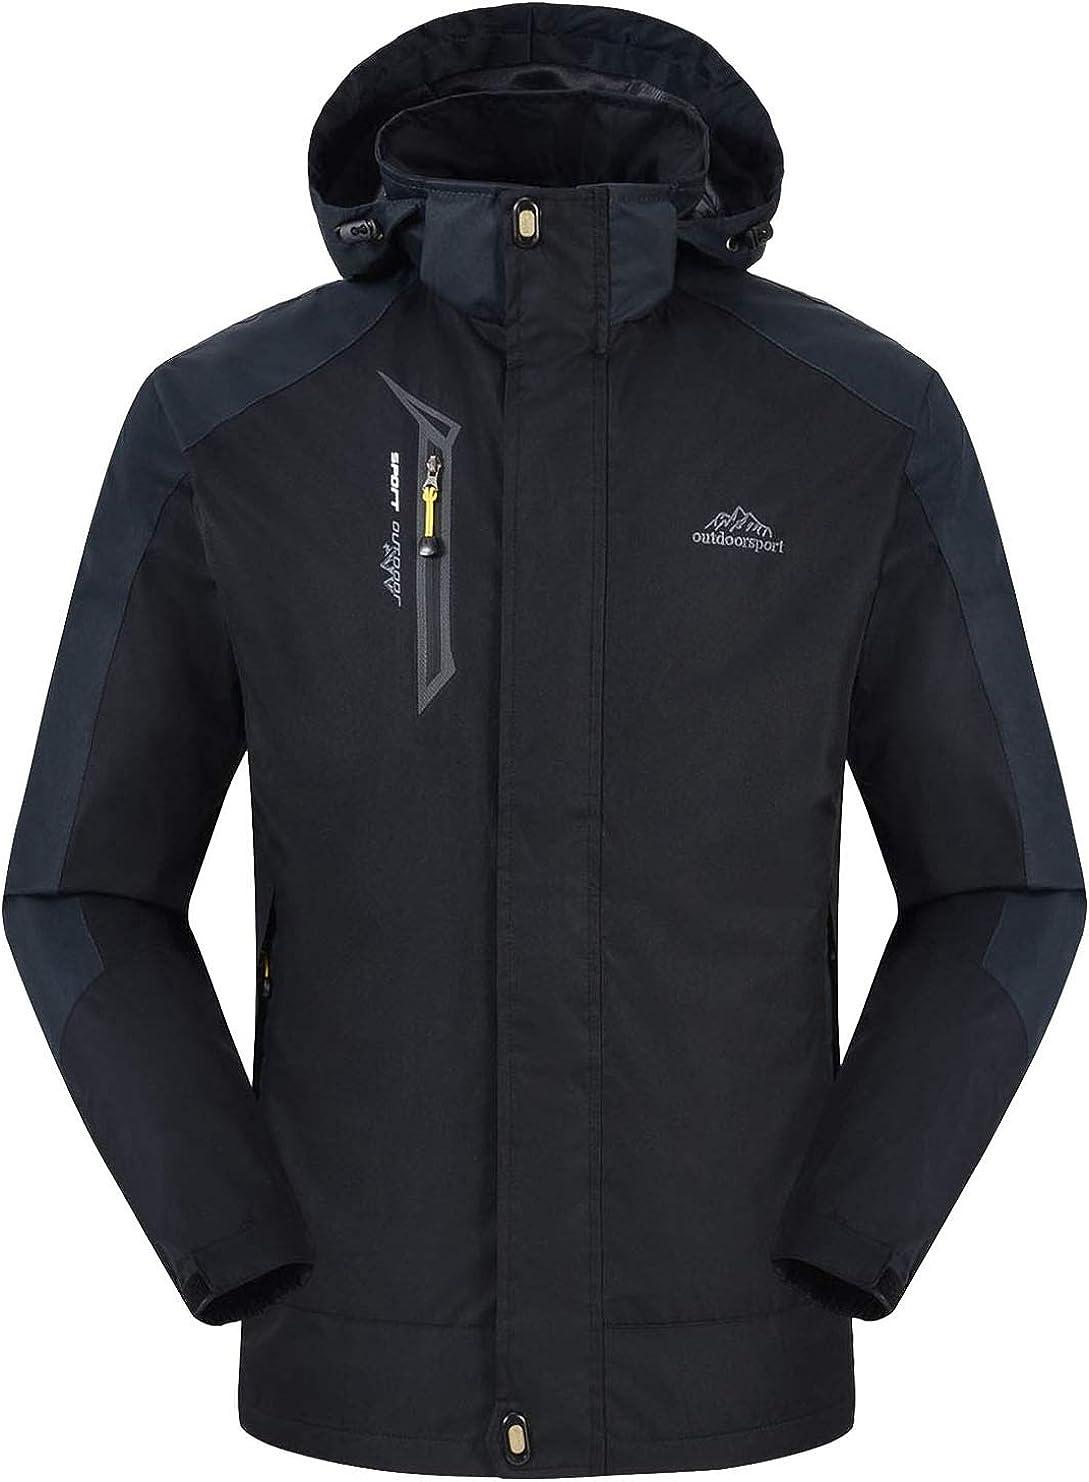 Rdruko Men's Hiking Jacket Waterproof Windproof Casual Outdoor Softshell Raincoat Sportswear Hooded